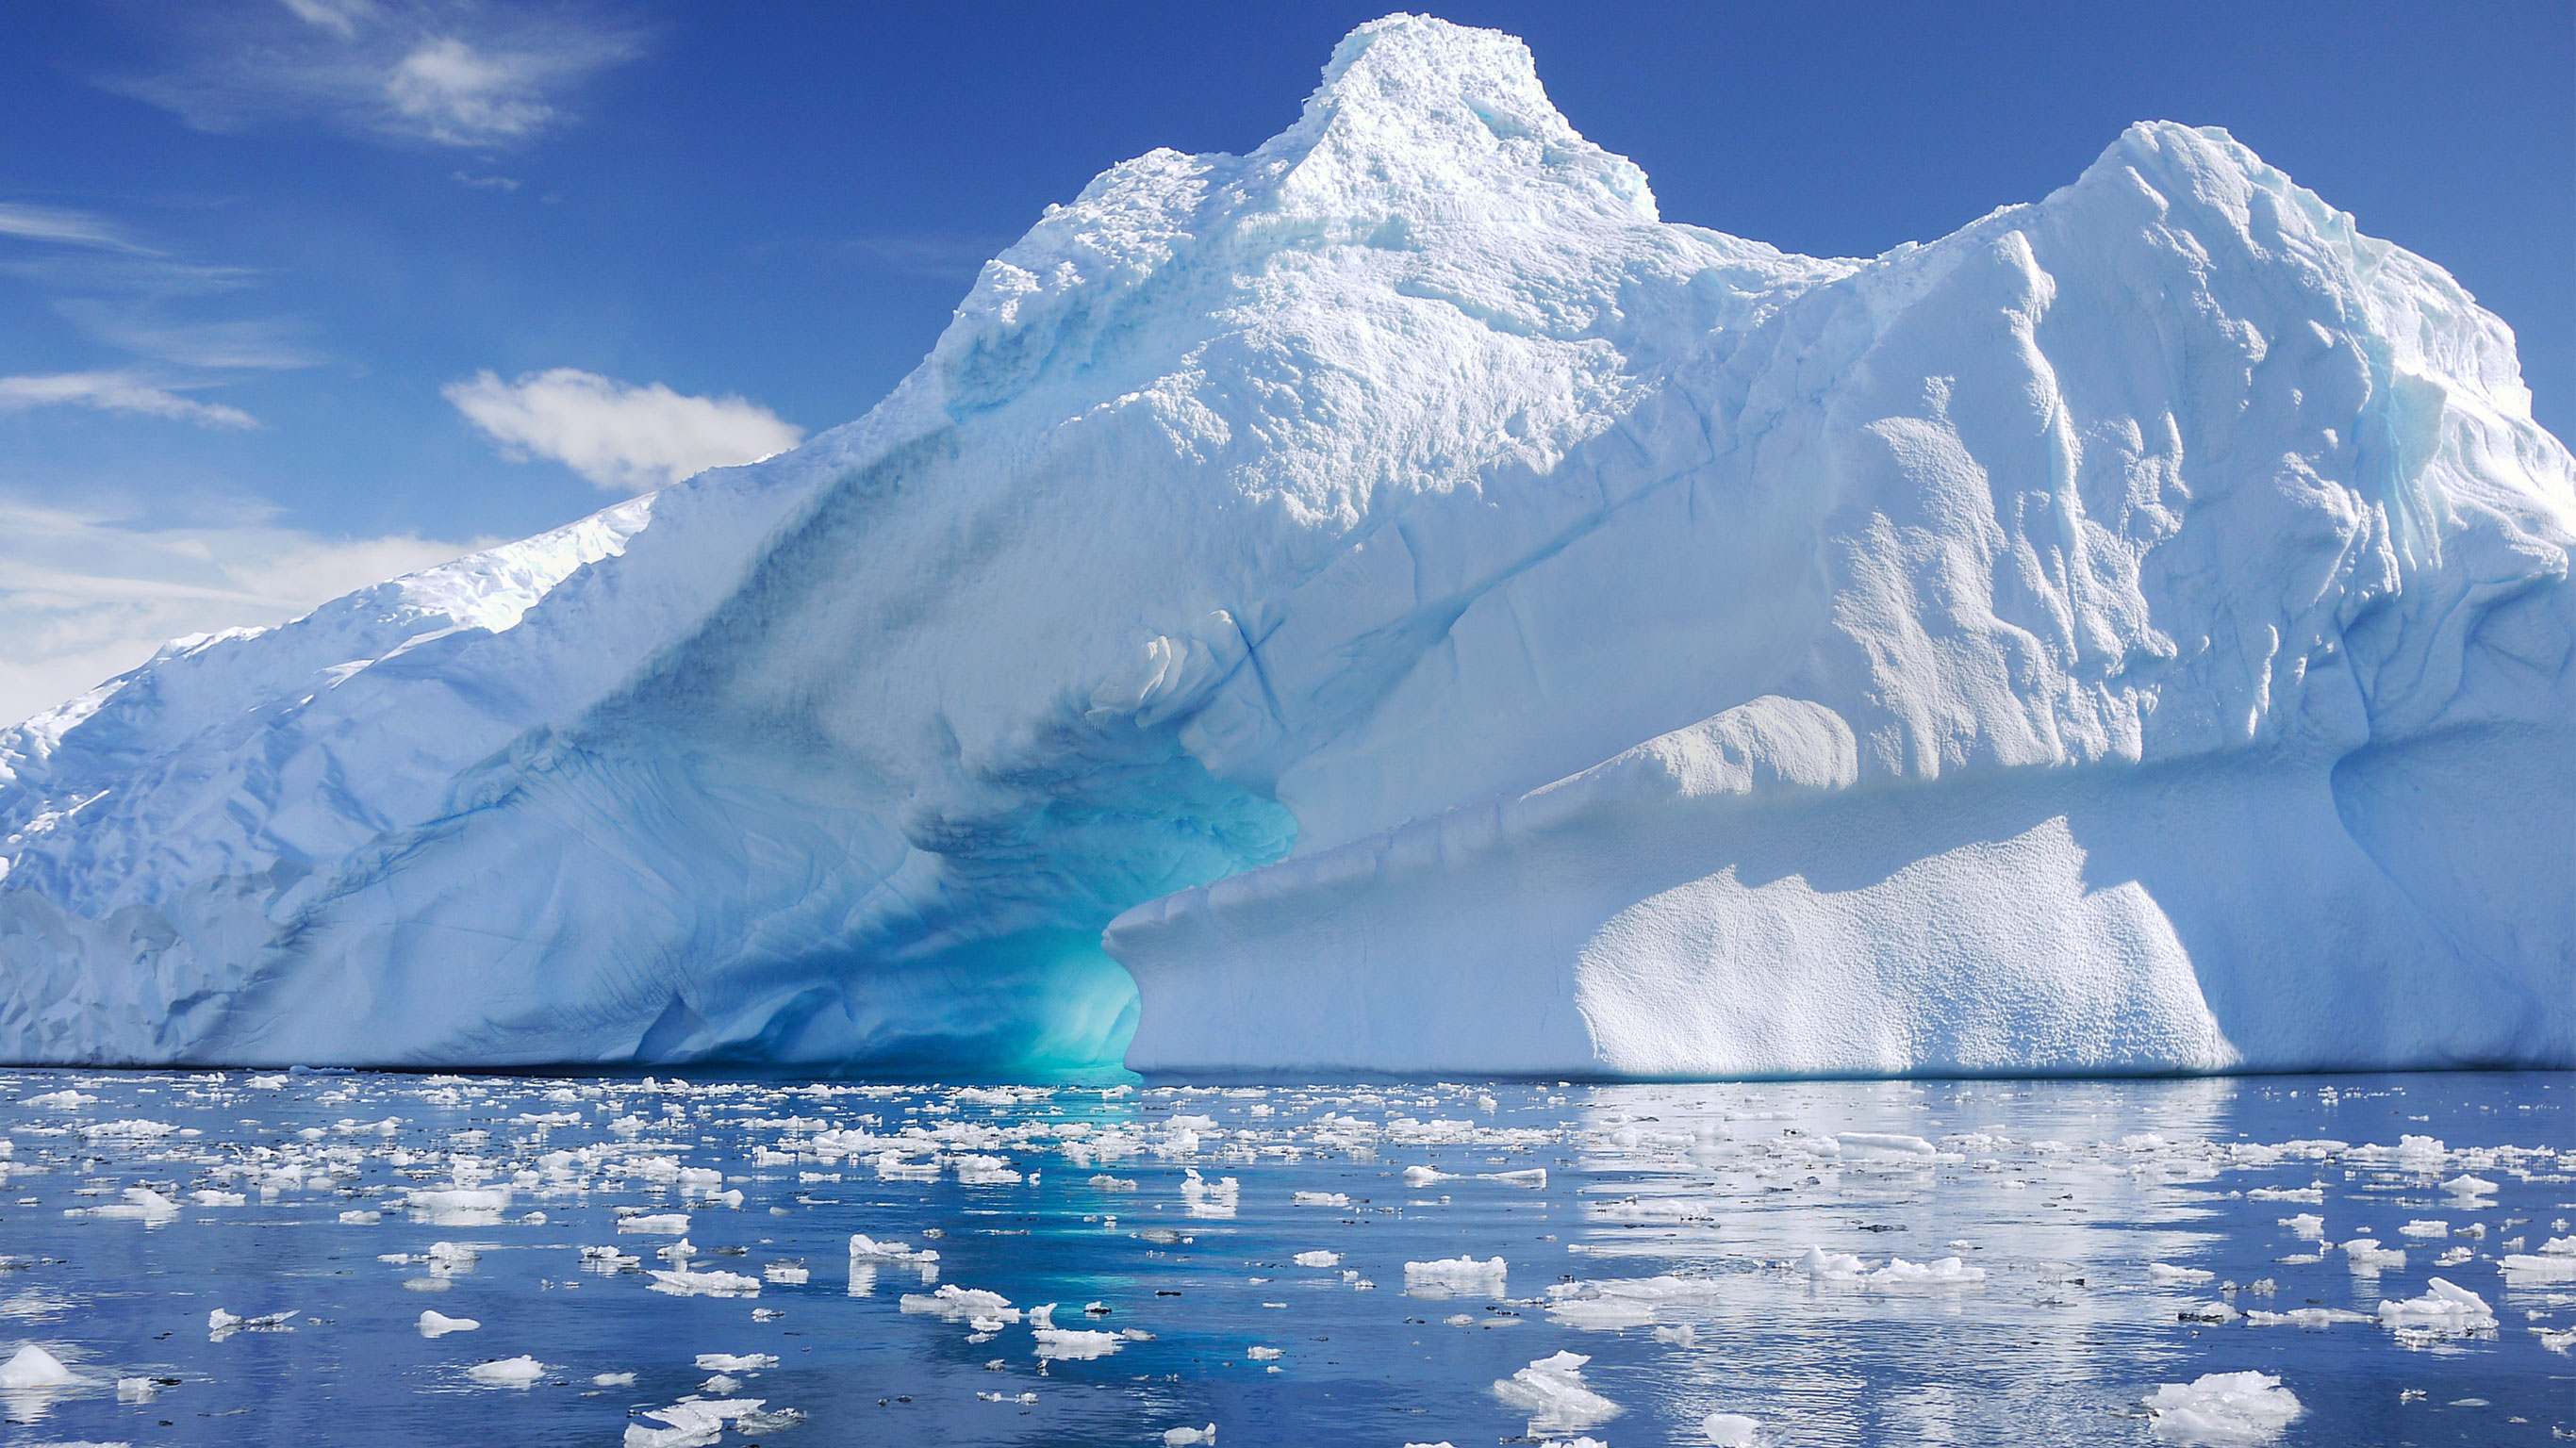 Stockists of Antarctica Classic in Depth